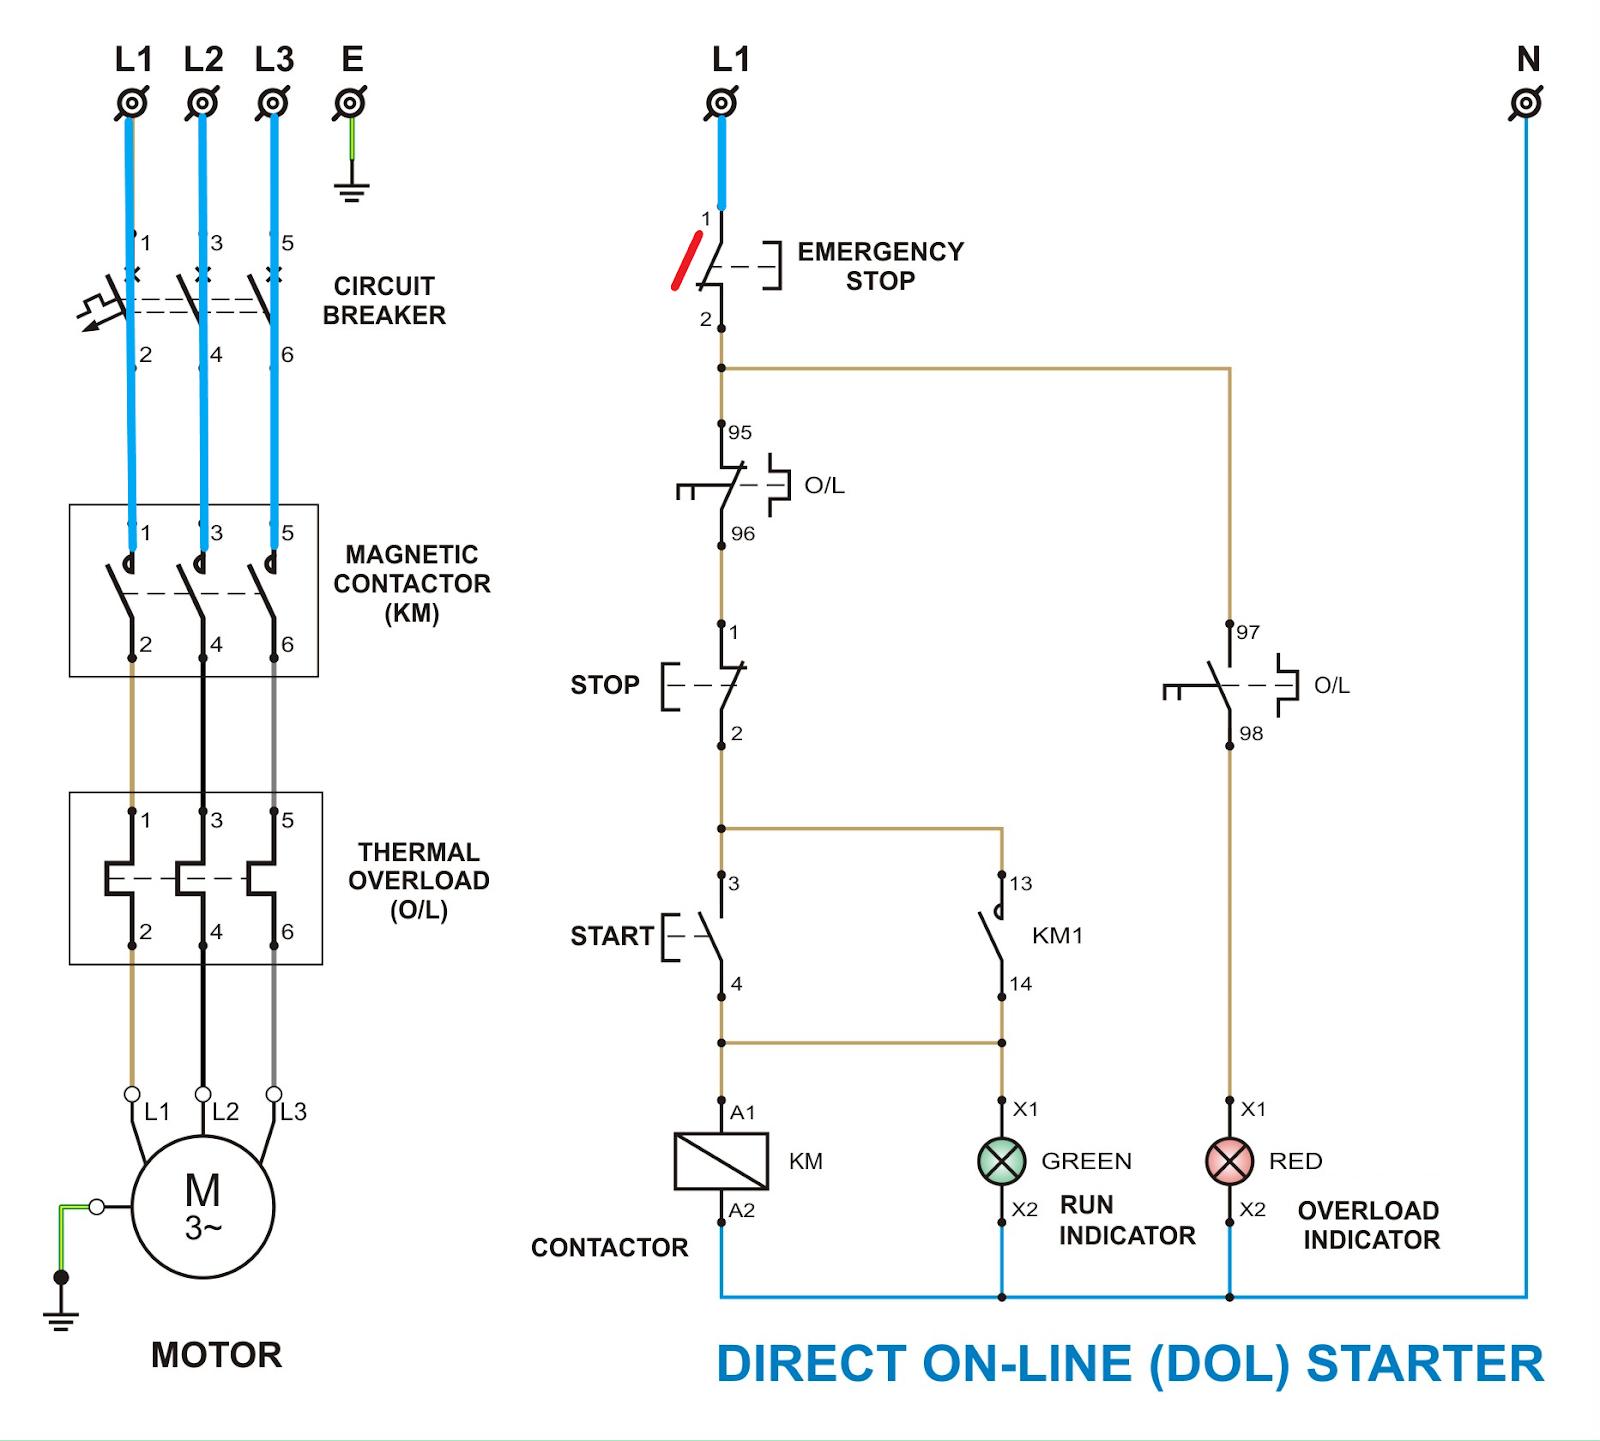 電氣生涯 Electrical Life: 電機控制電路 - 直接起動及控制線路 Direct On Line Starter with the control circuit